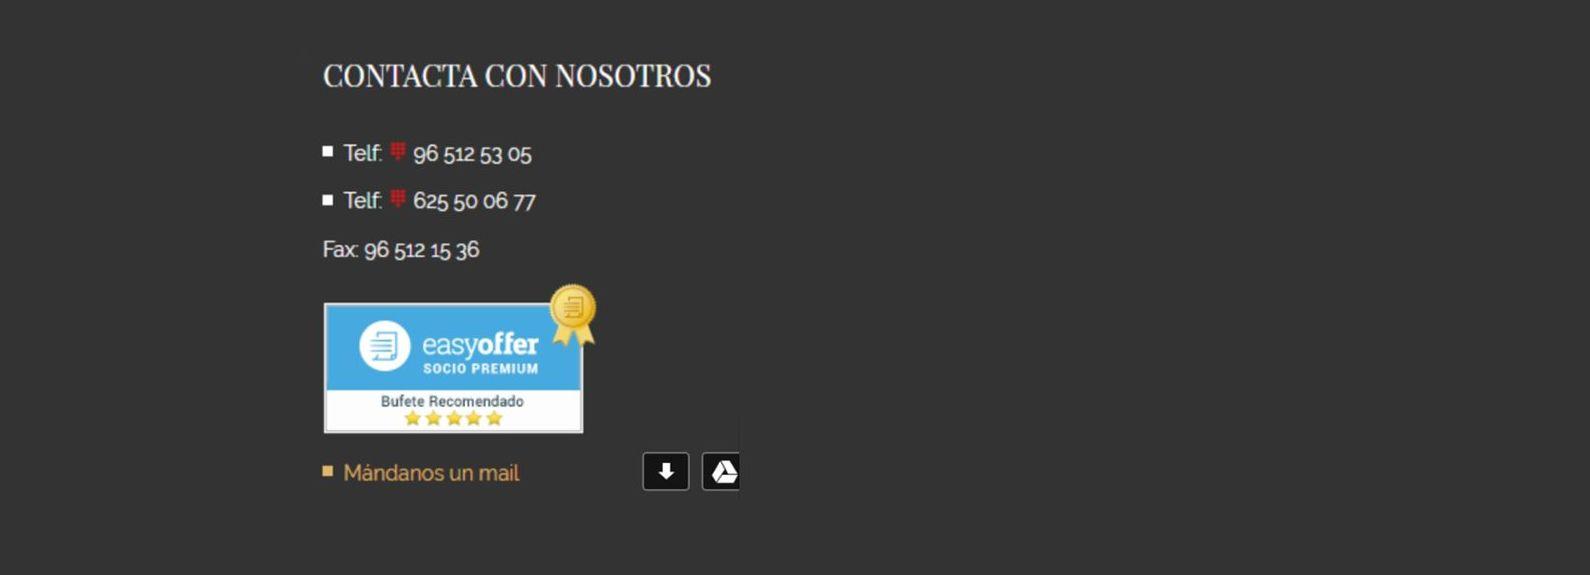 Insignia Socio Premium EasyOfler: Servicios de Iván Martínez López Abogado - Gabinete Jurídico